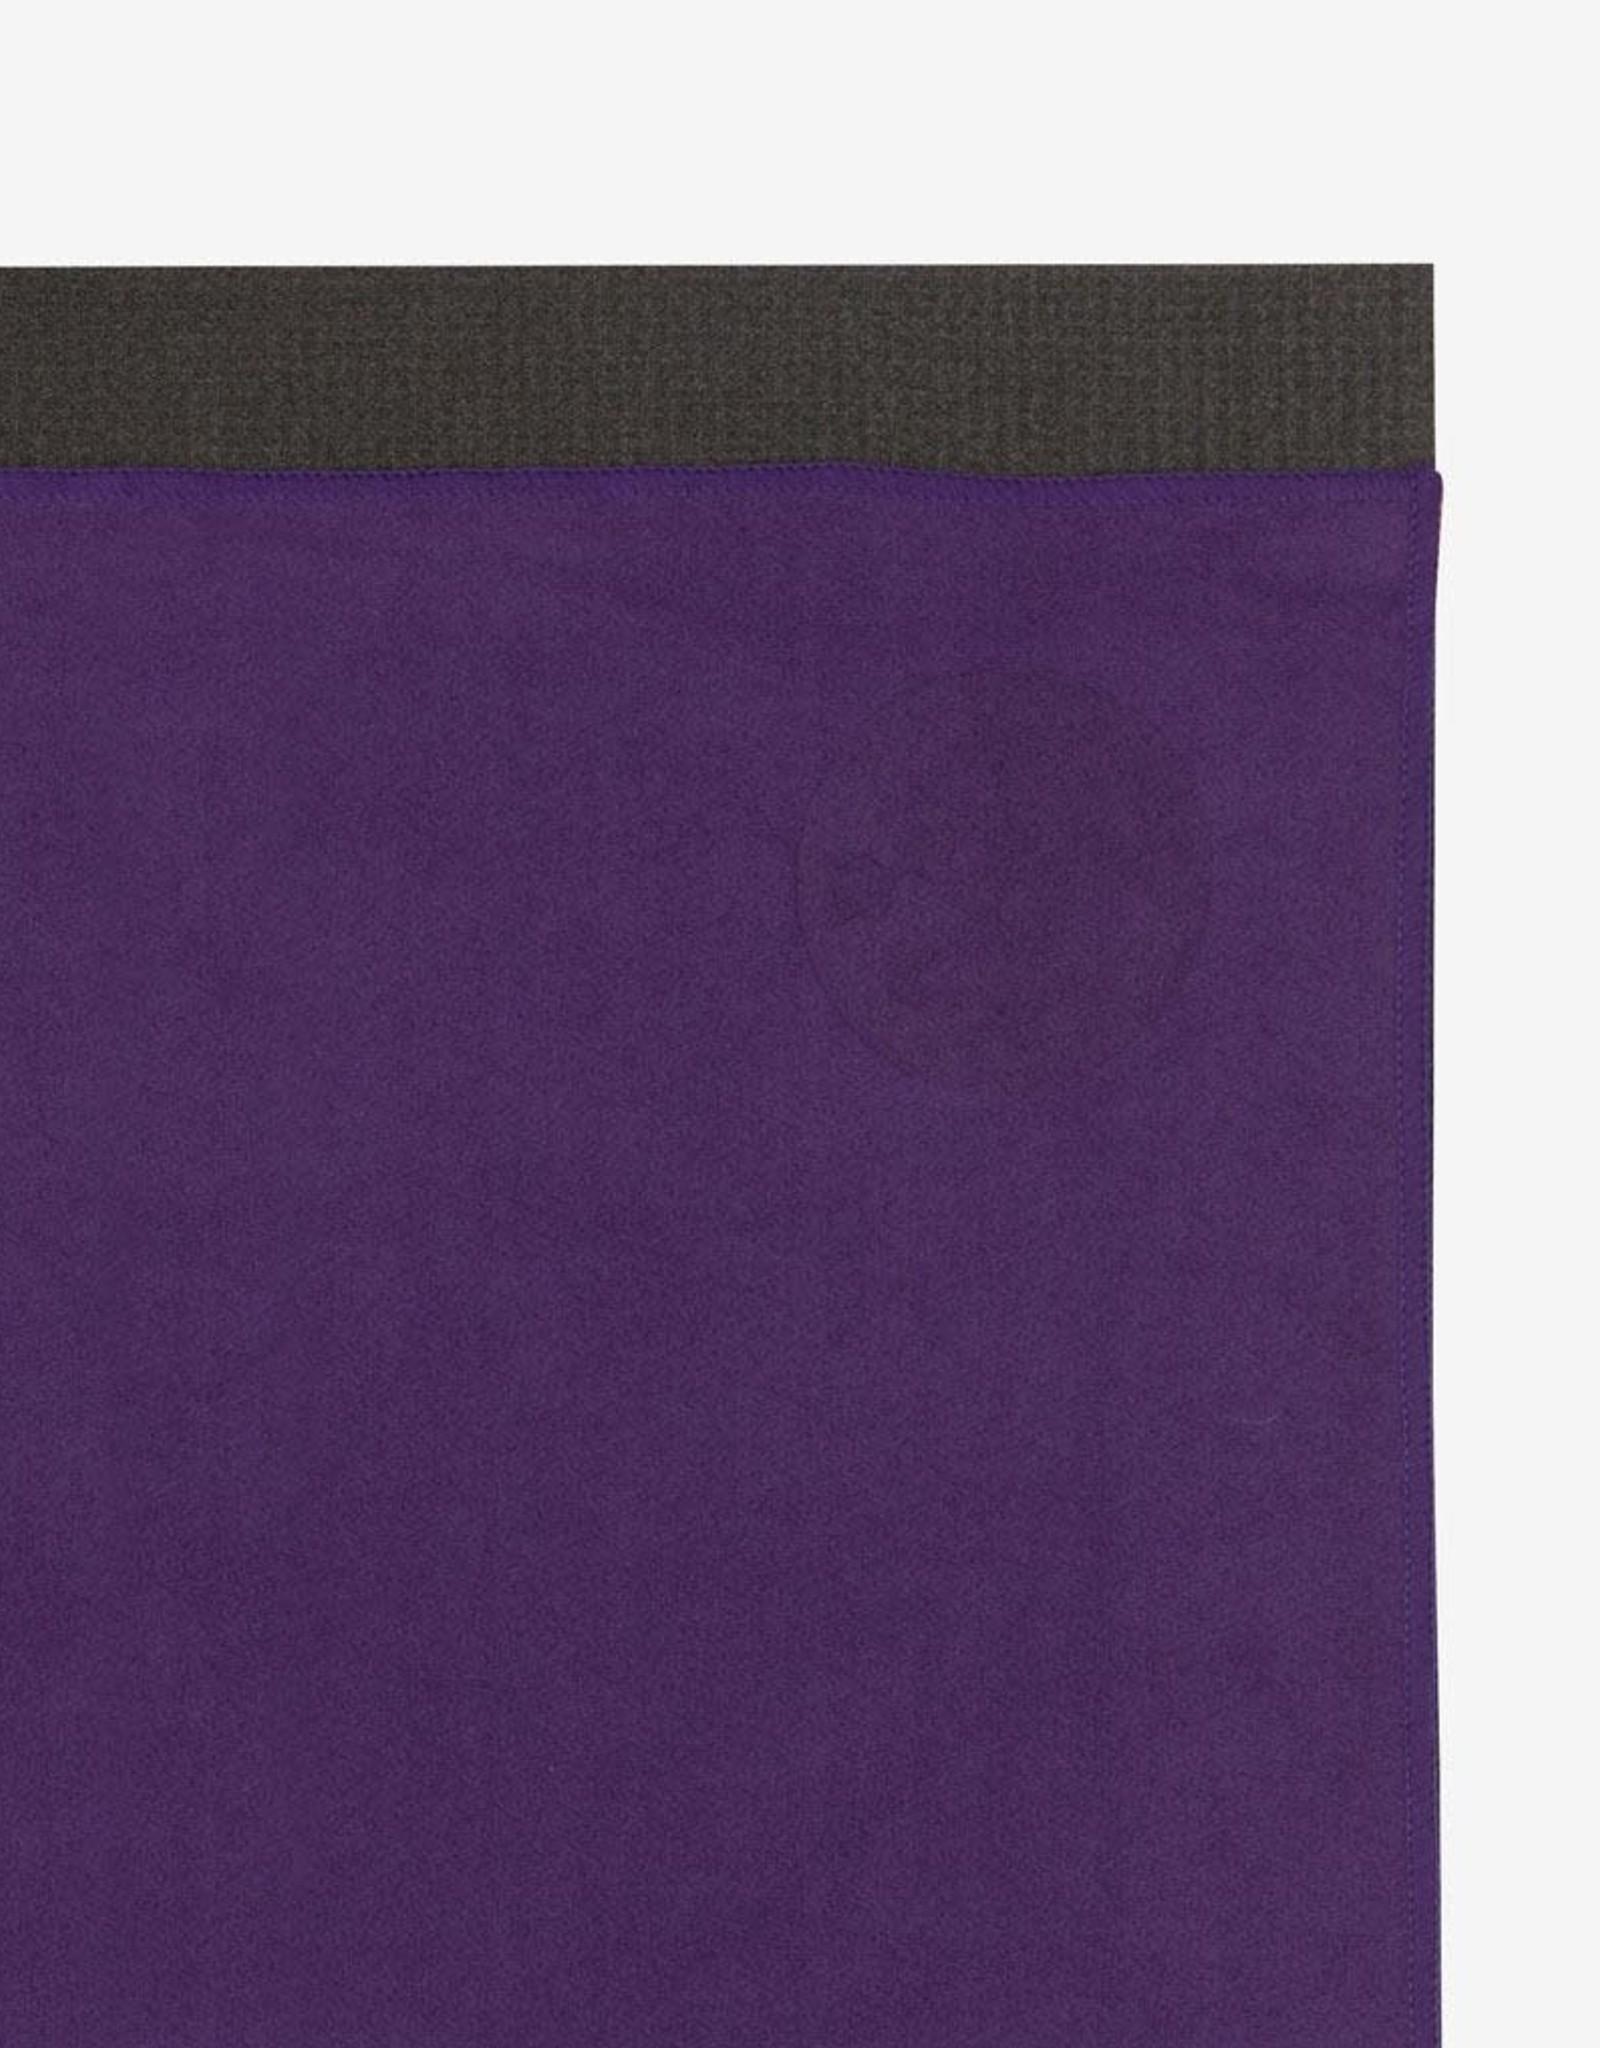 Manduka eQua Mat Towel - Standard - Black Magic (Purple)